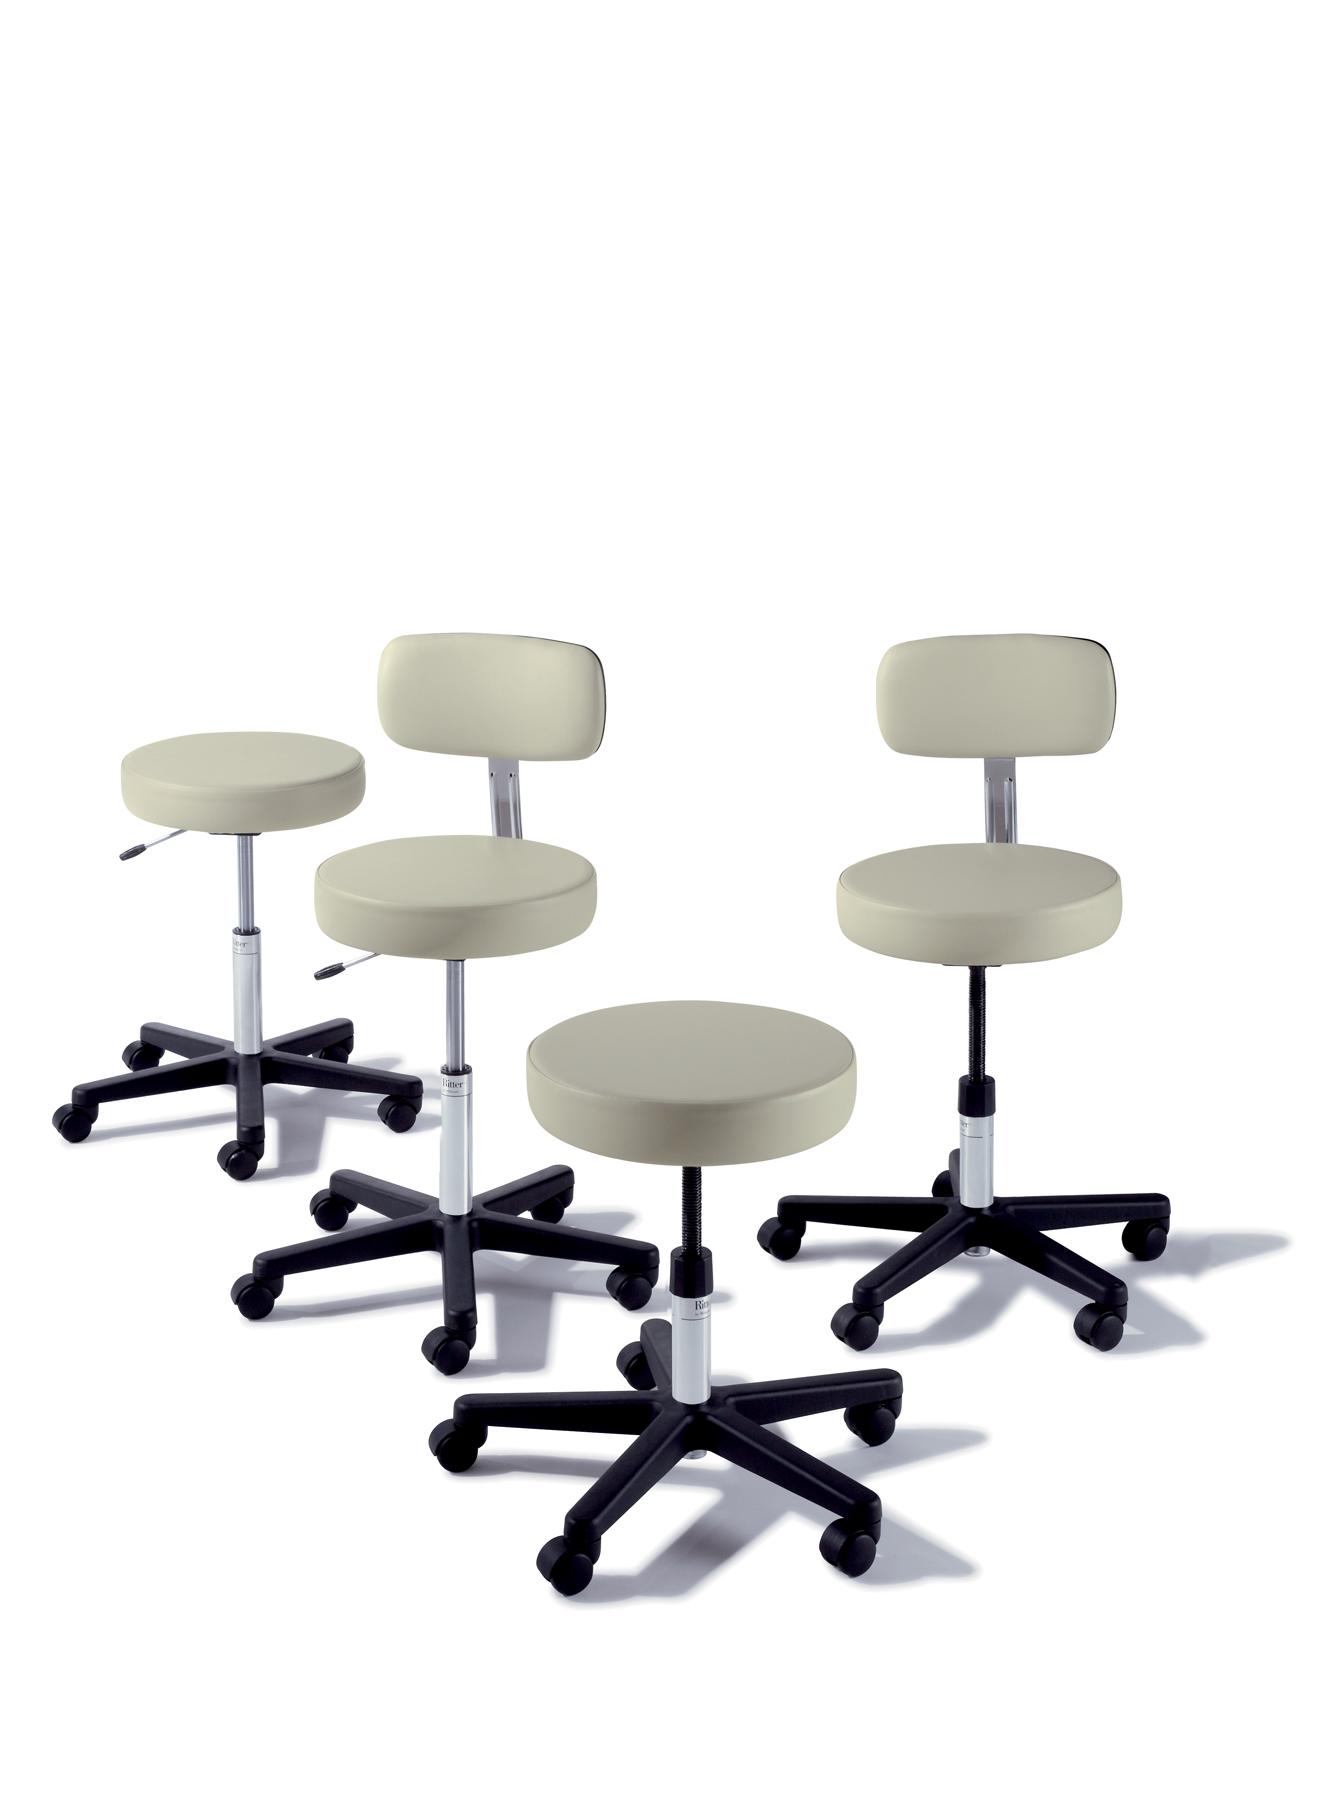 273_value-series-stools-h